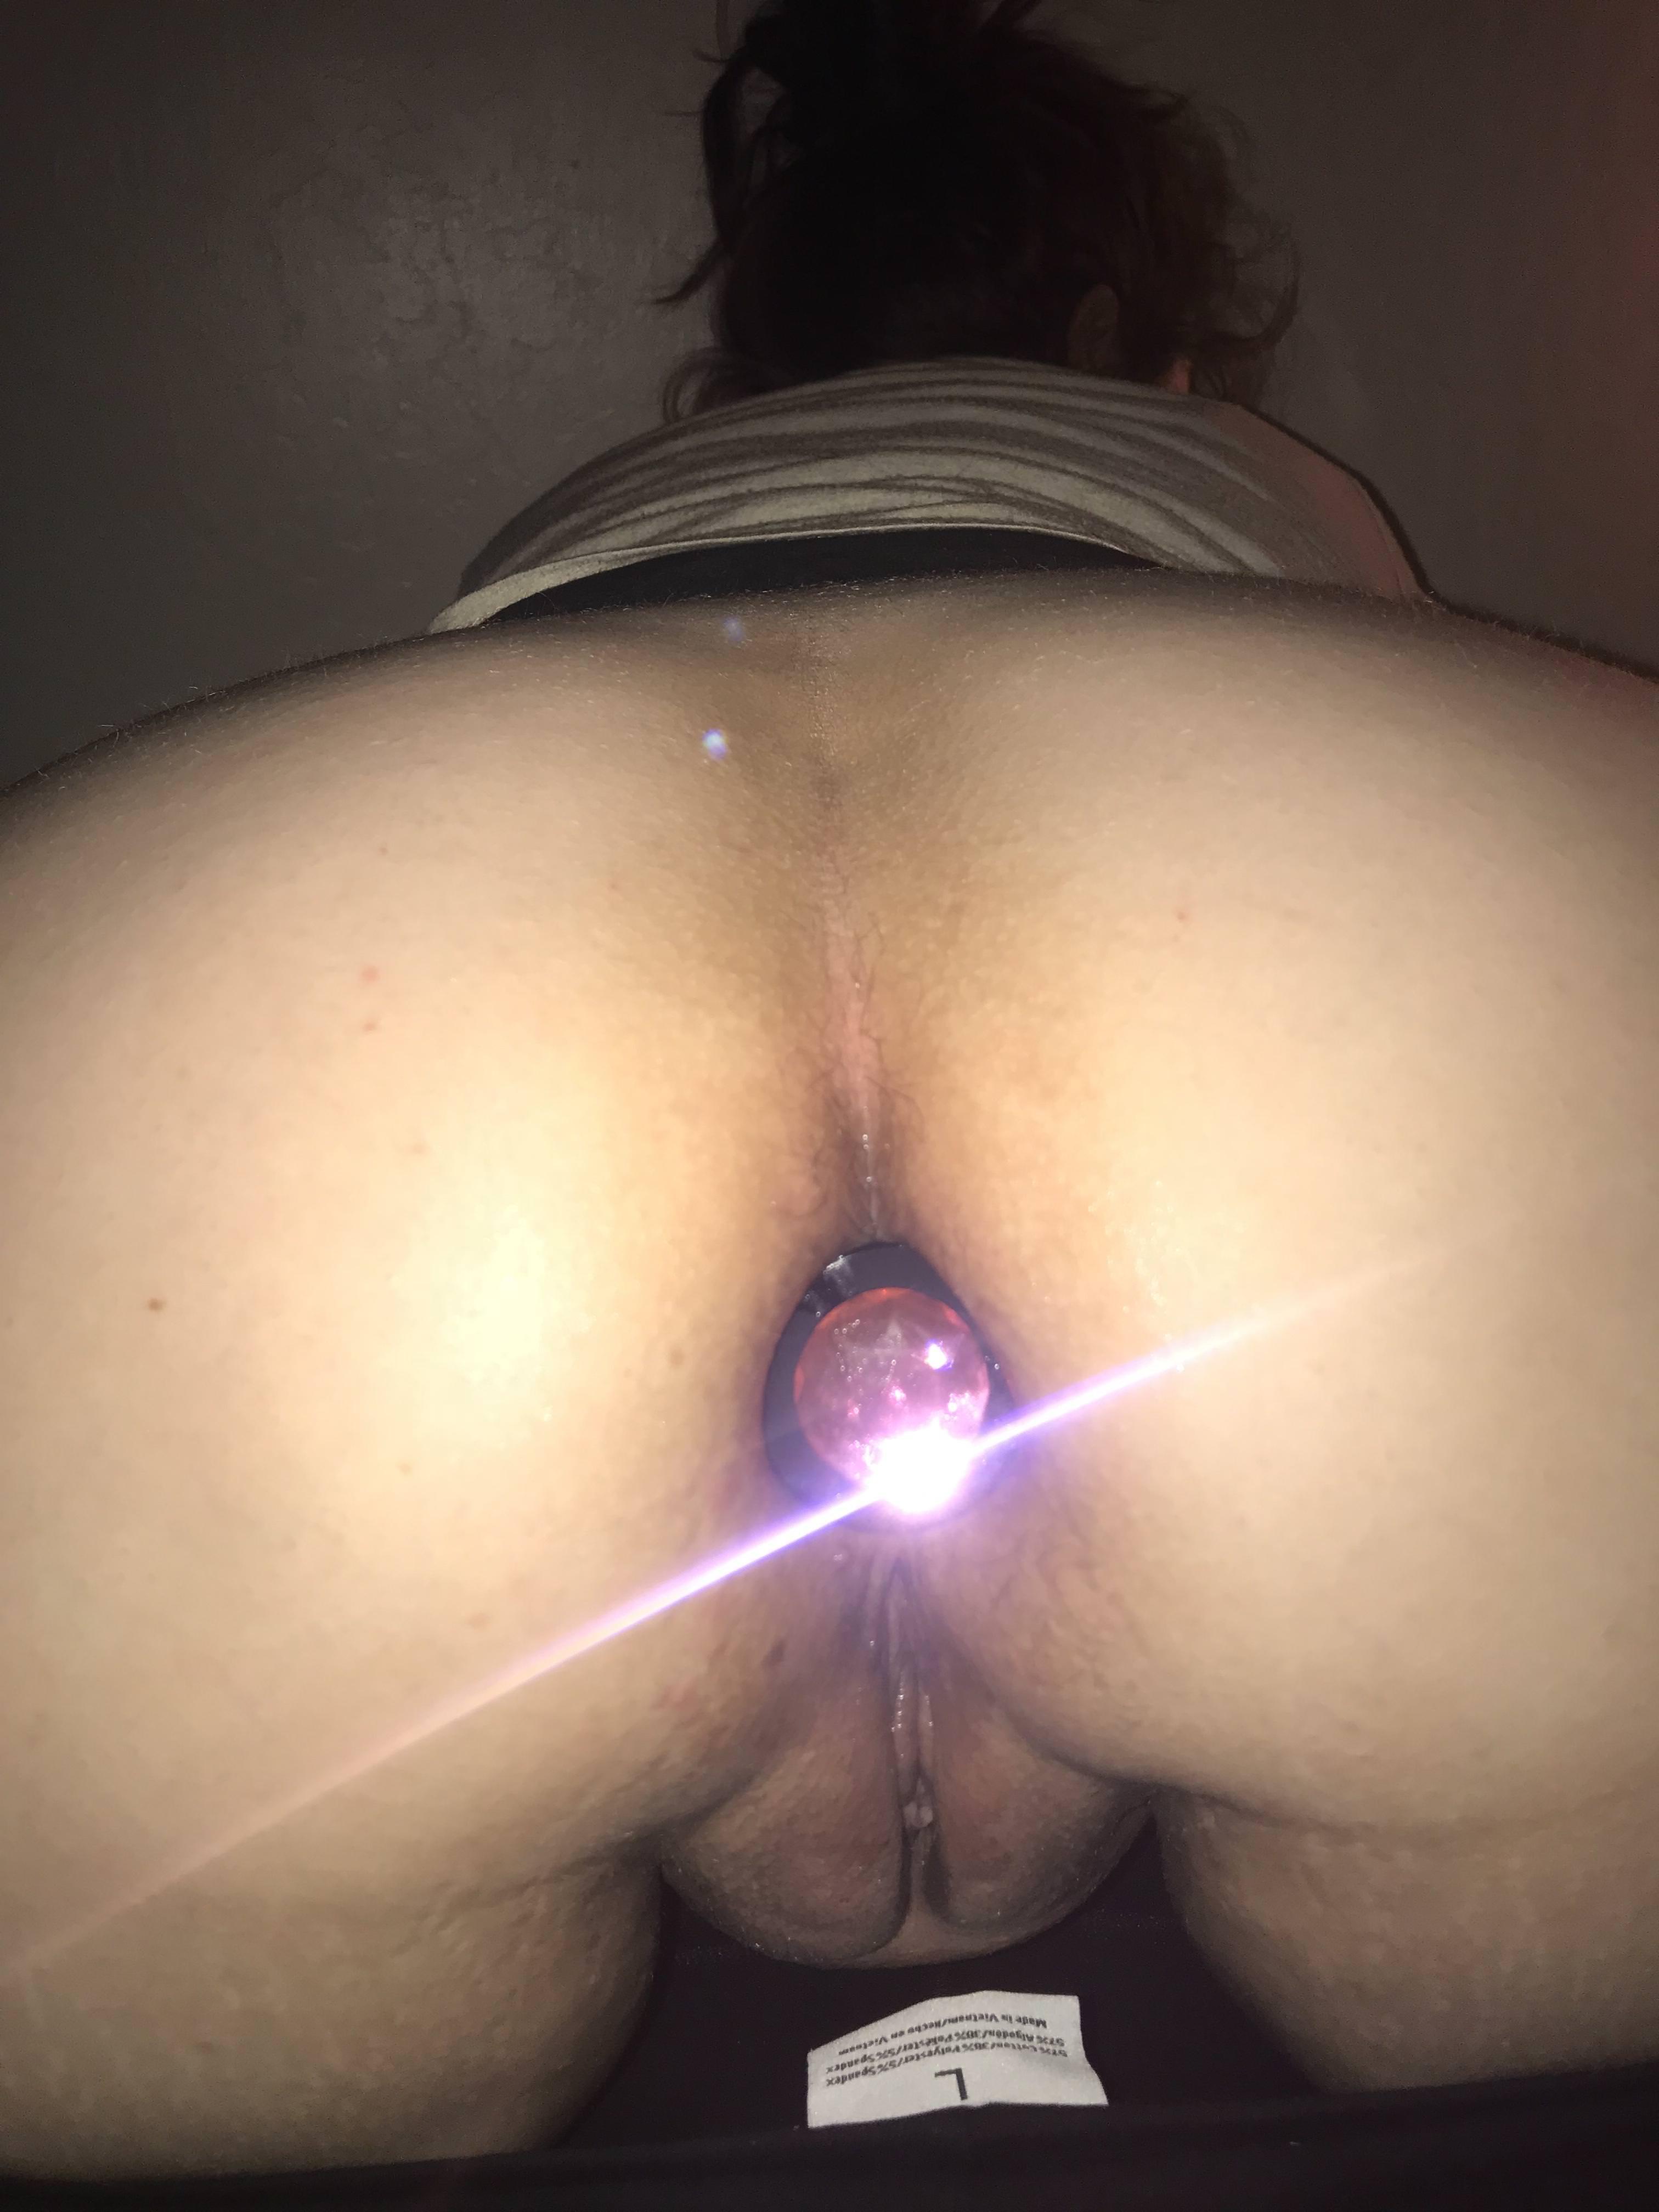 Bobbi starr bondage